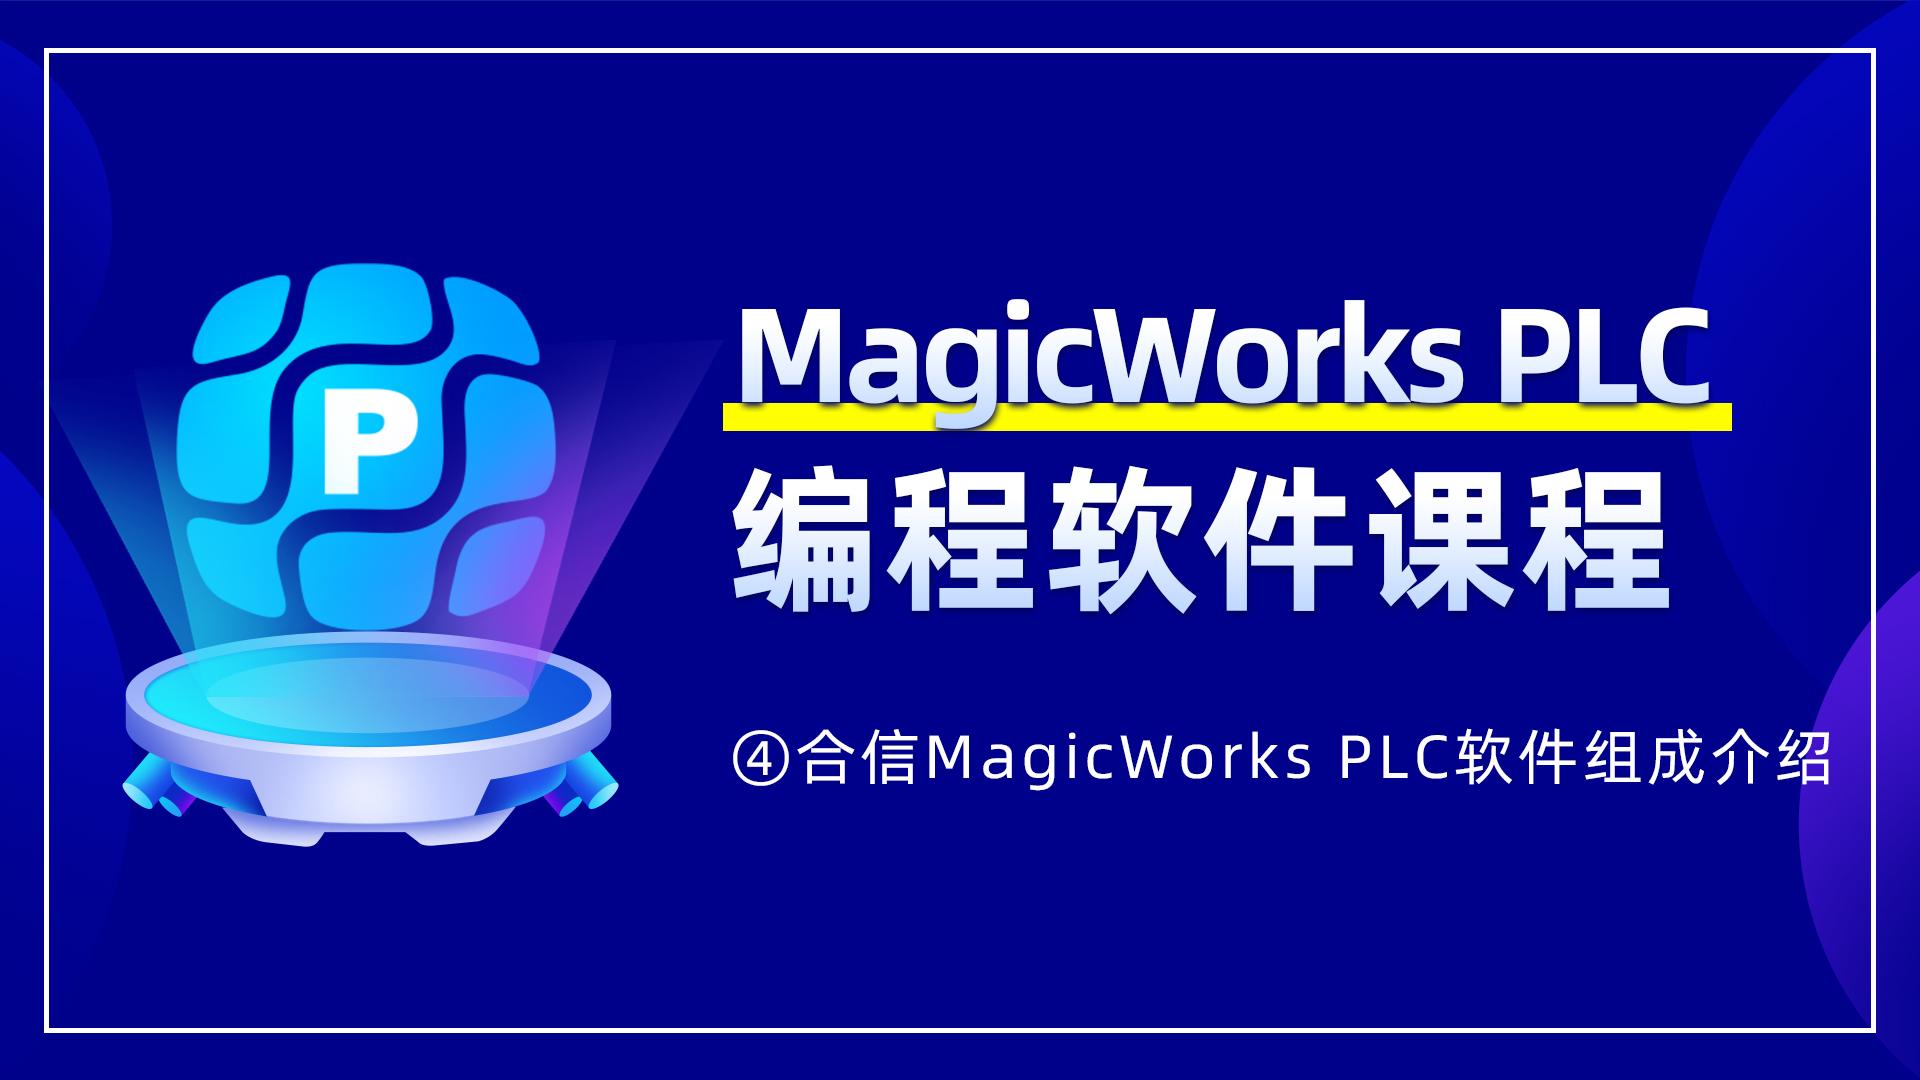 4. 合信MagicWorks PLC软件组成介绍